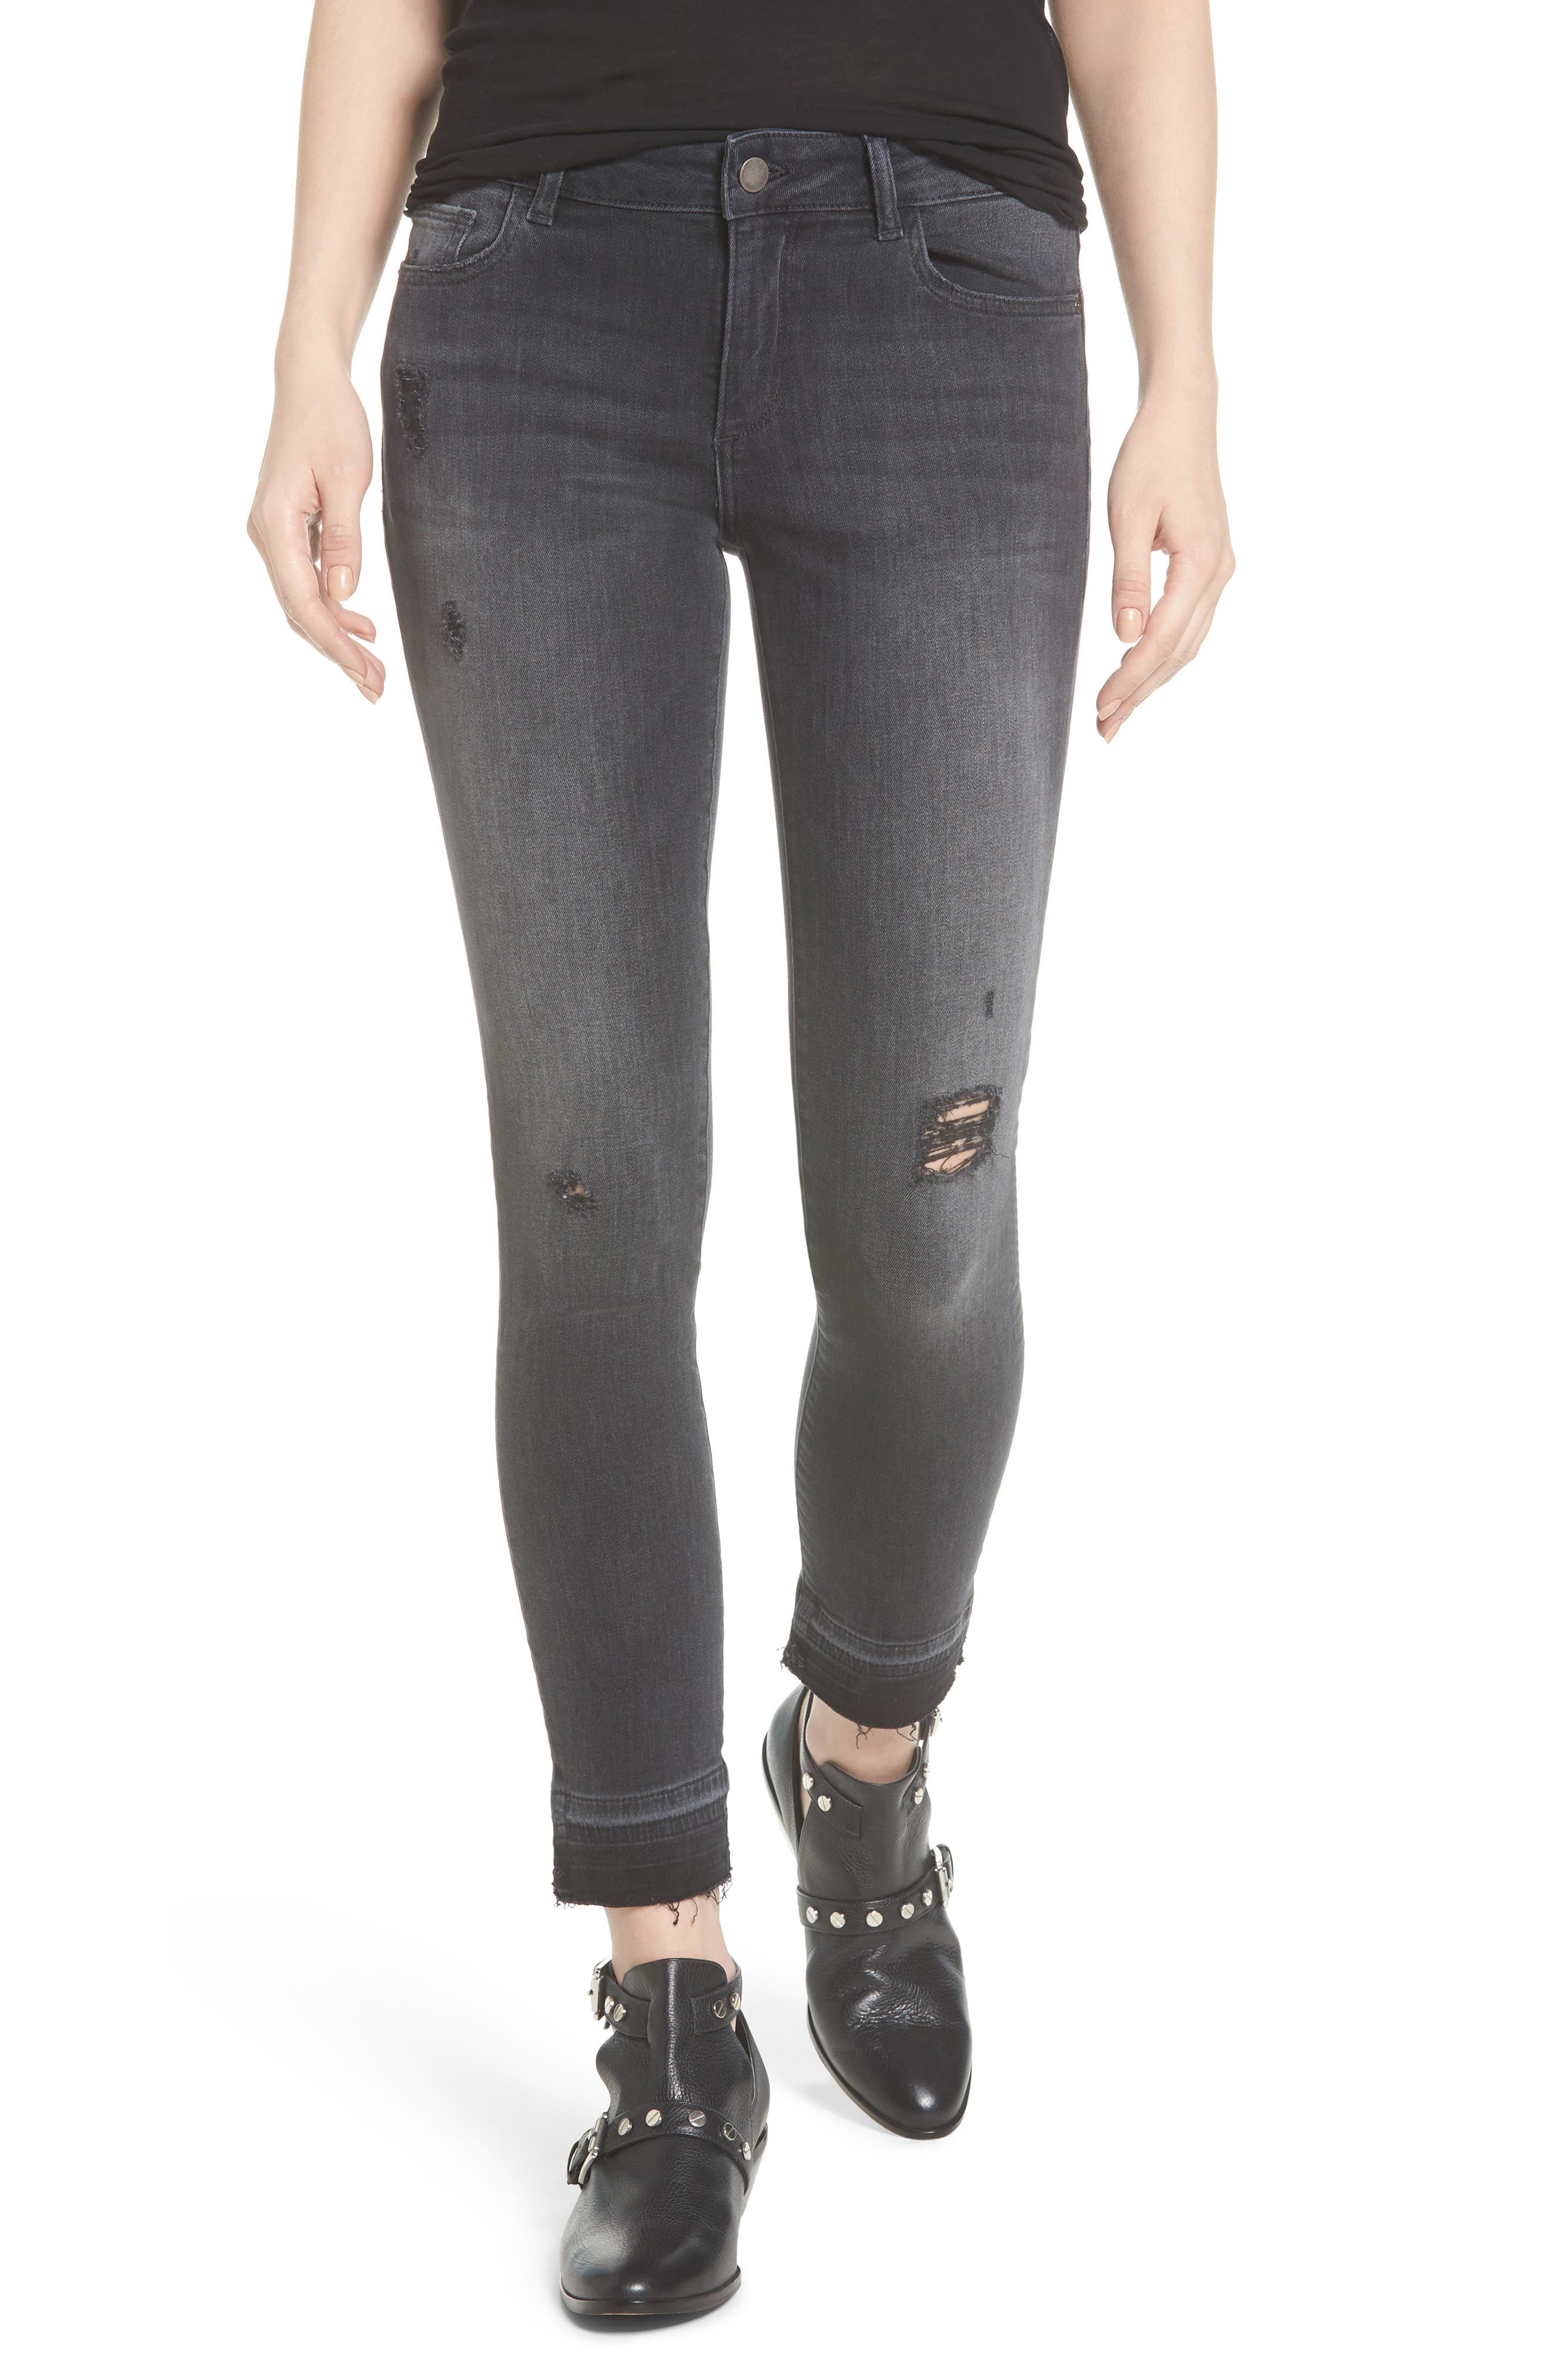 Emma Power Legging Jeans,                         Main,                         color, Seneca